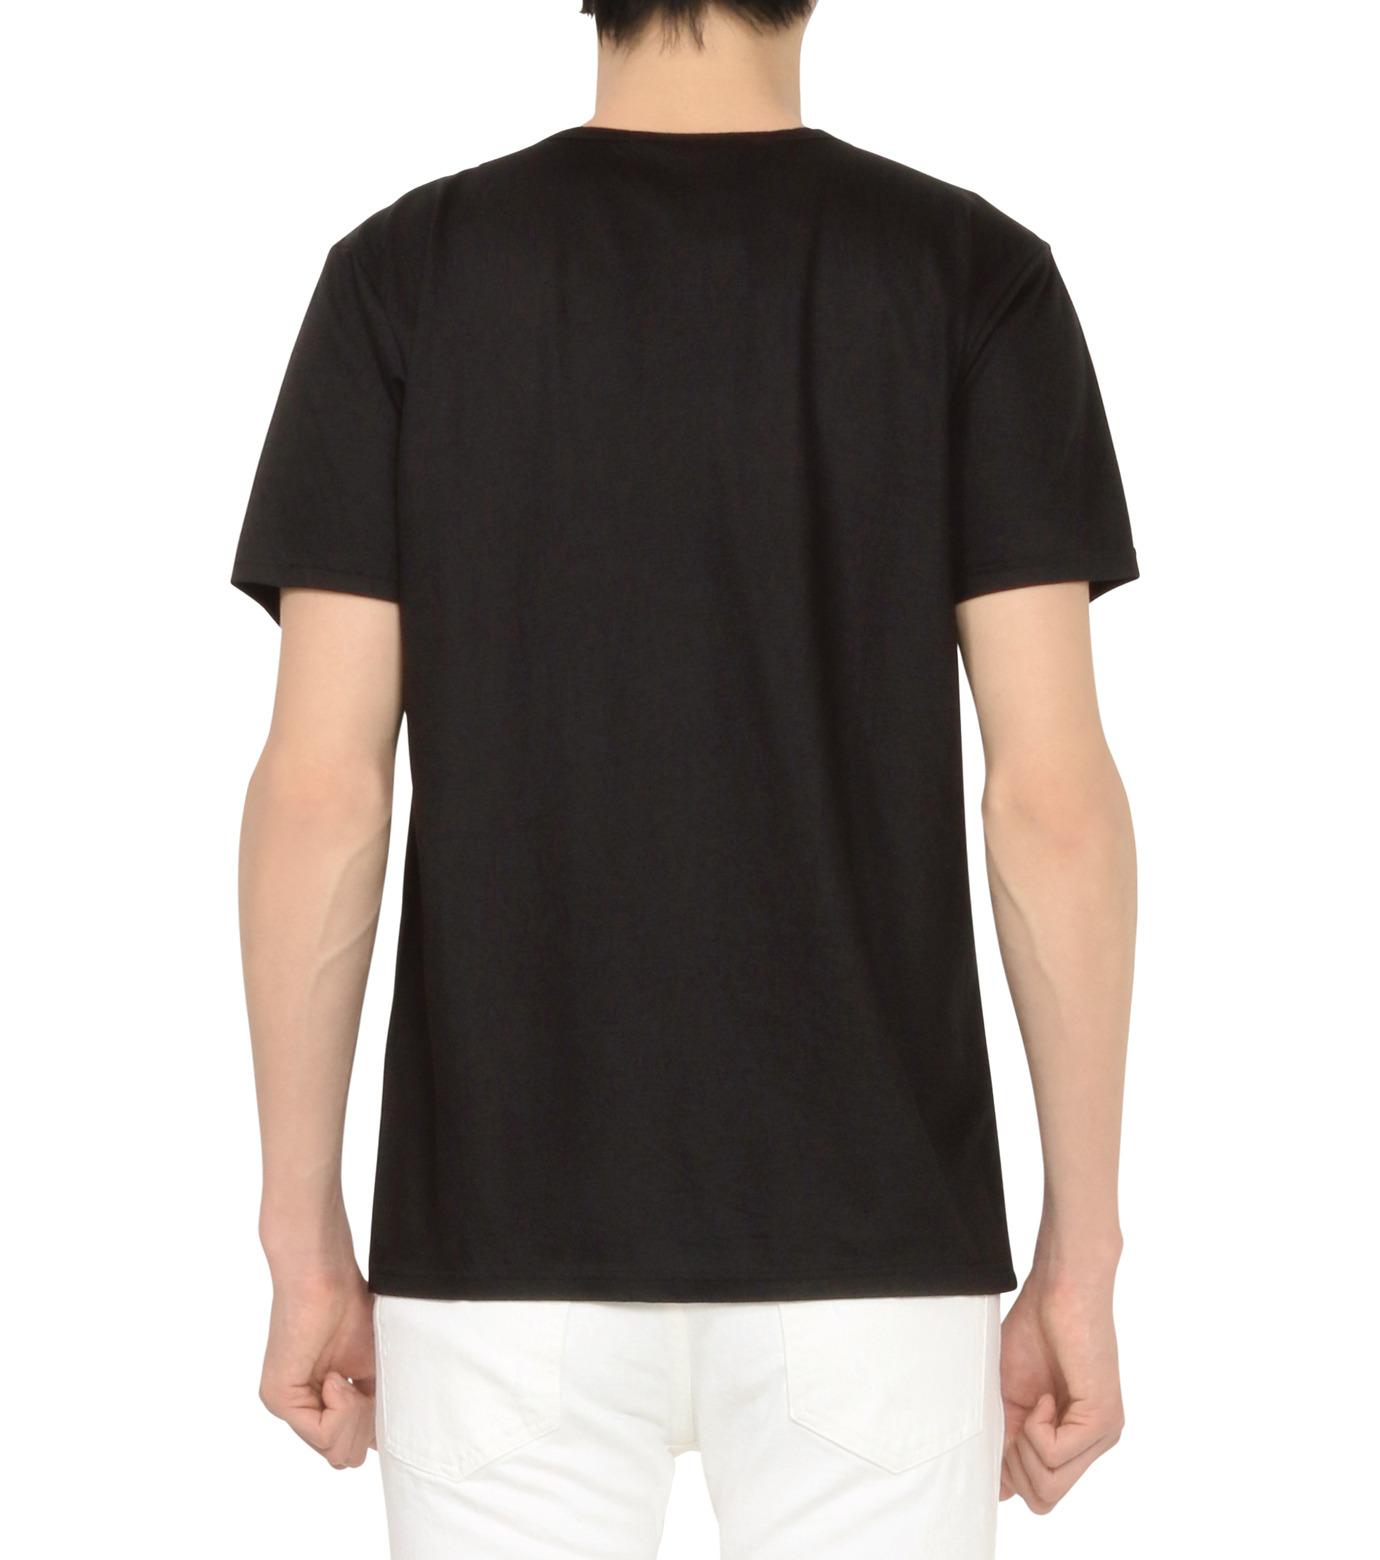 HL HEDDIE LOVU(エイチエル・エディールーヴ)のOFFLINE pt TEE-BLACK(カットソー/cut and sewn)-18S92015-13 拡大詳細画像3